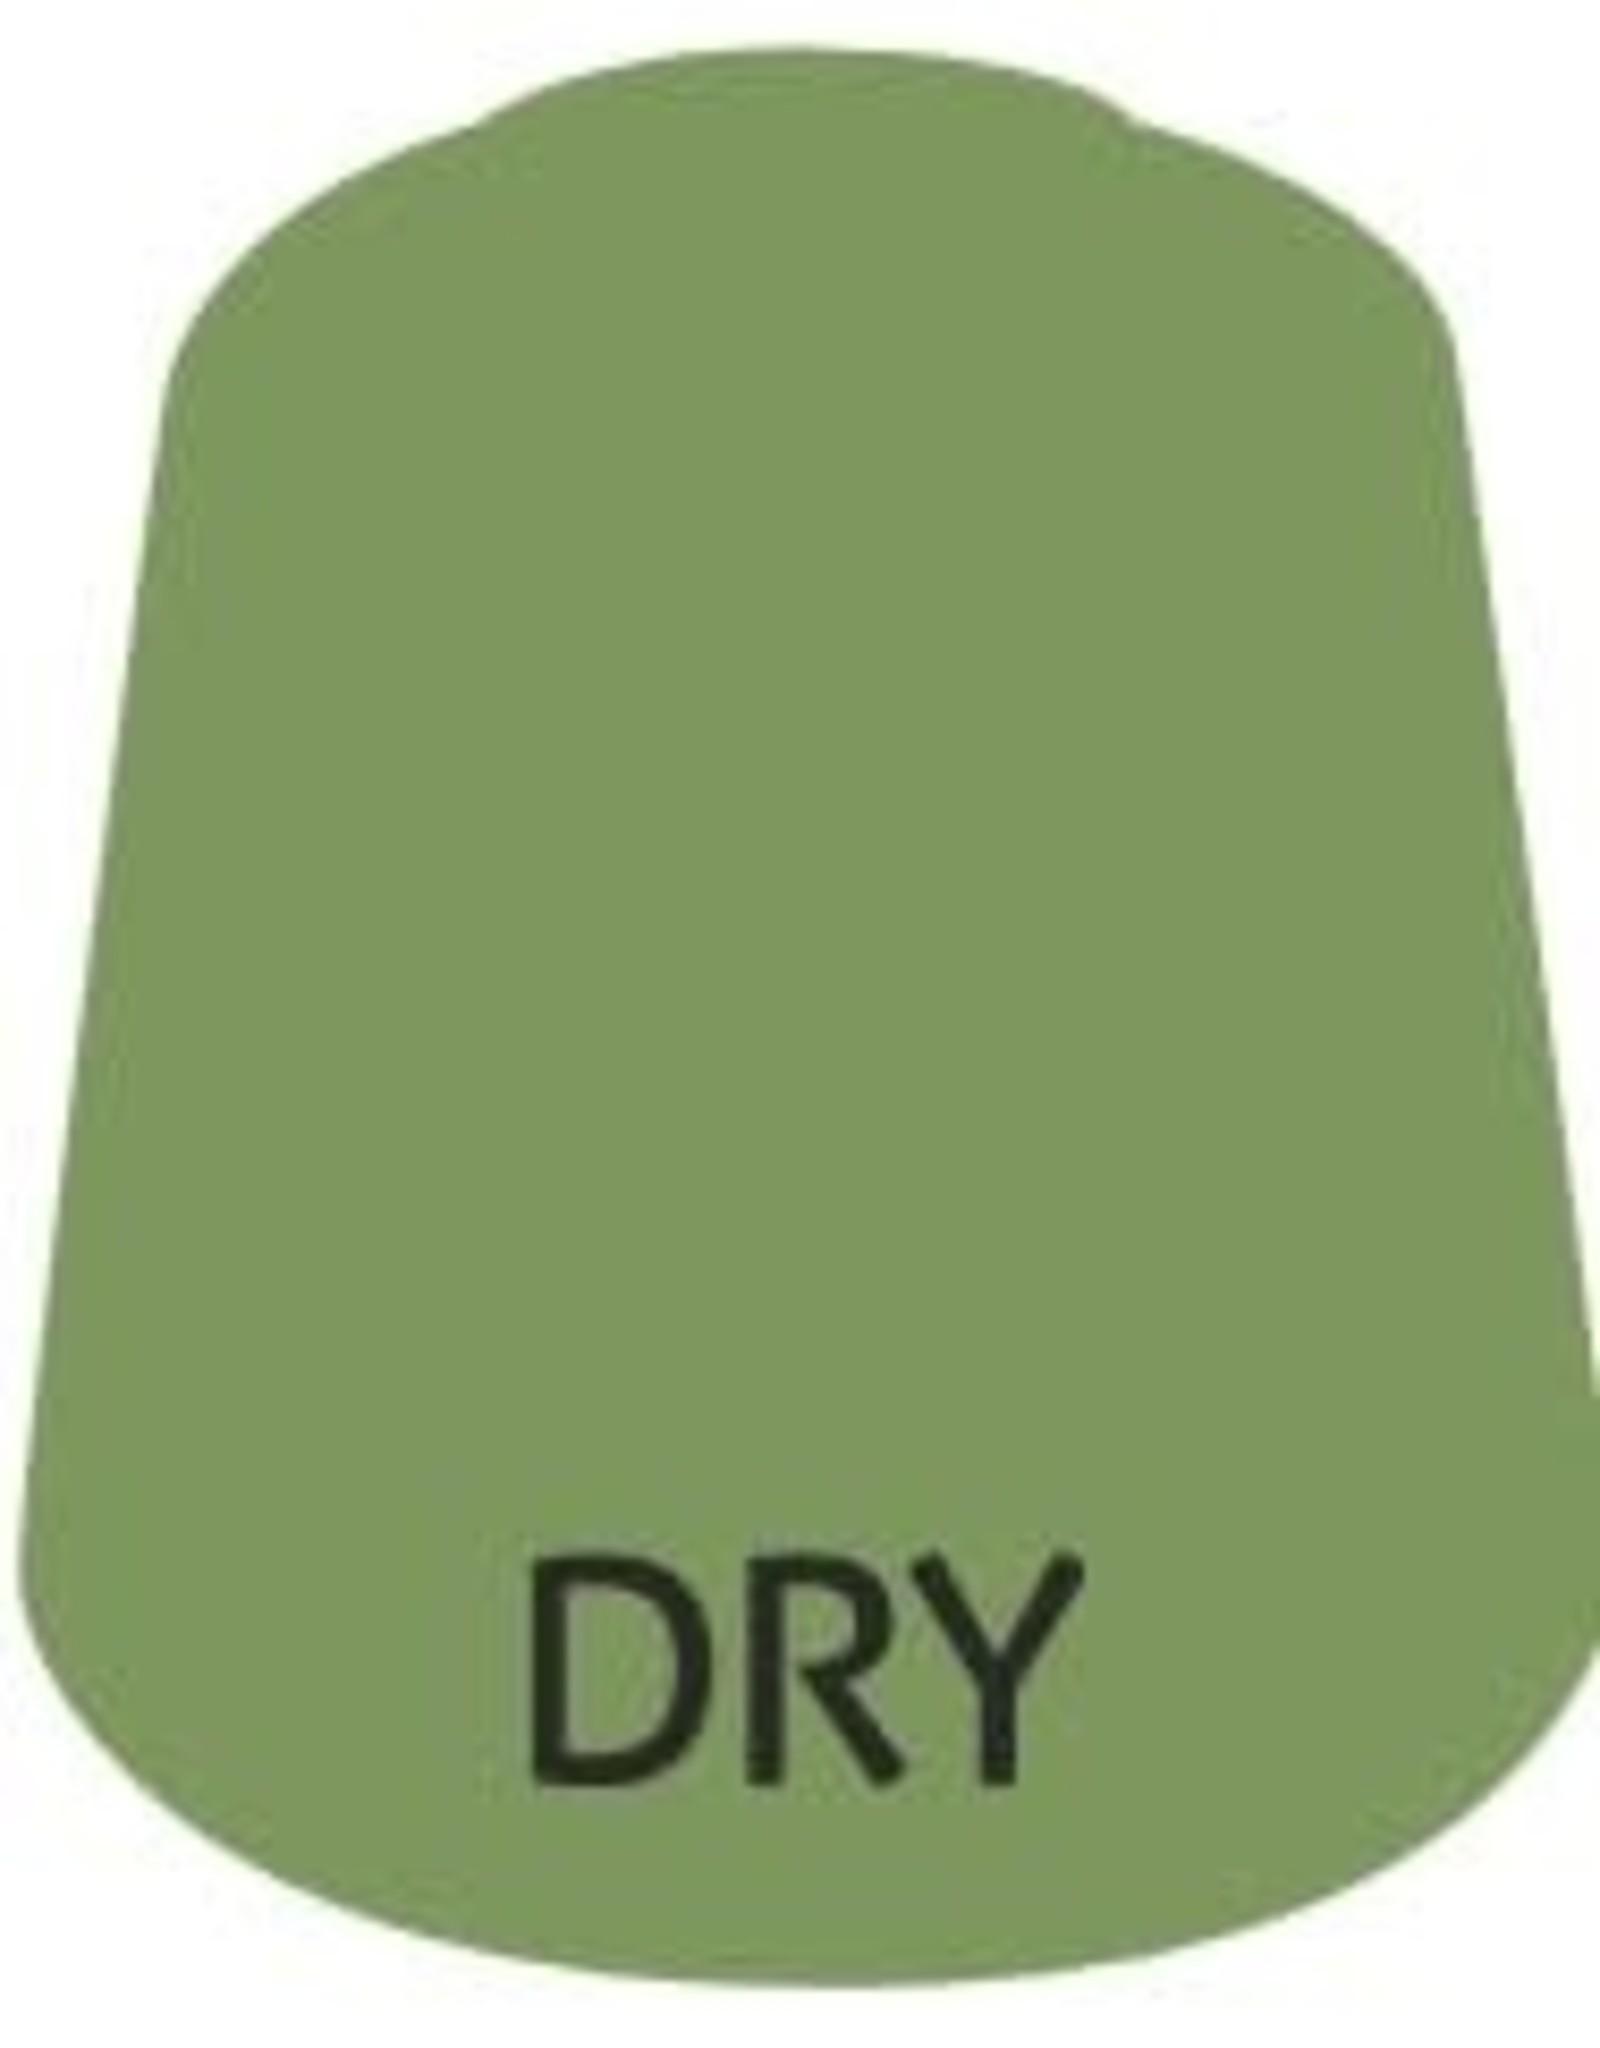 Games Workshop Nurgling Green (Dry)